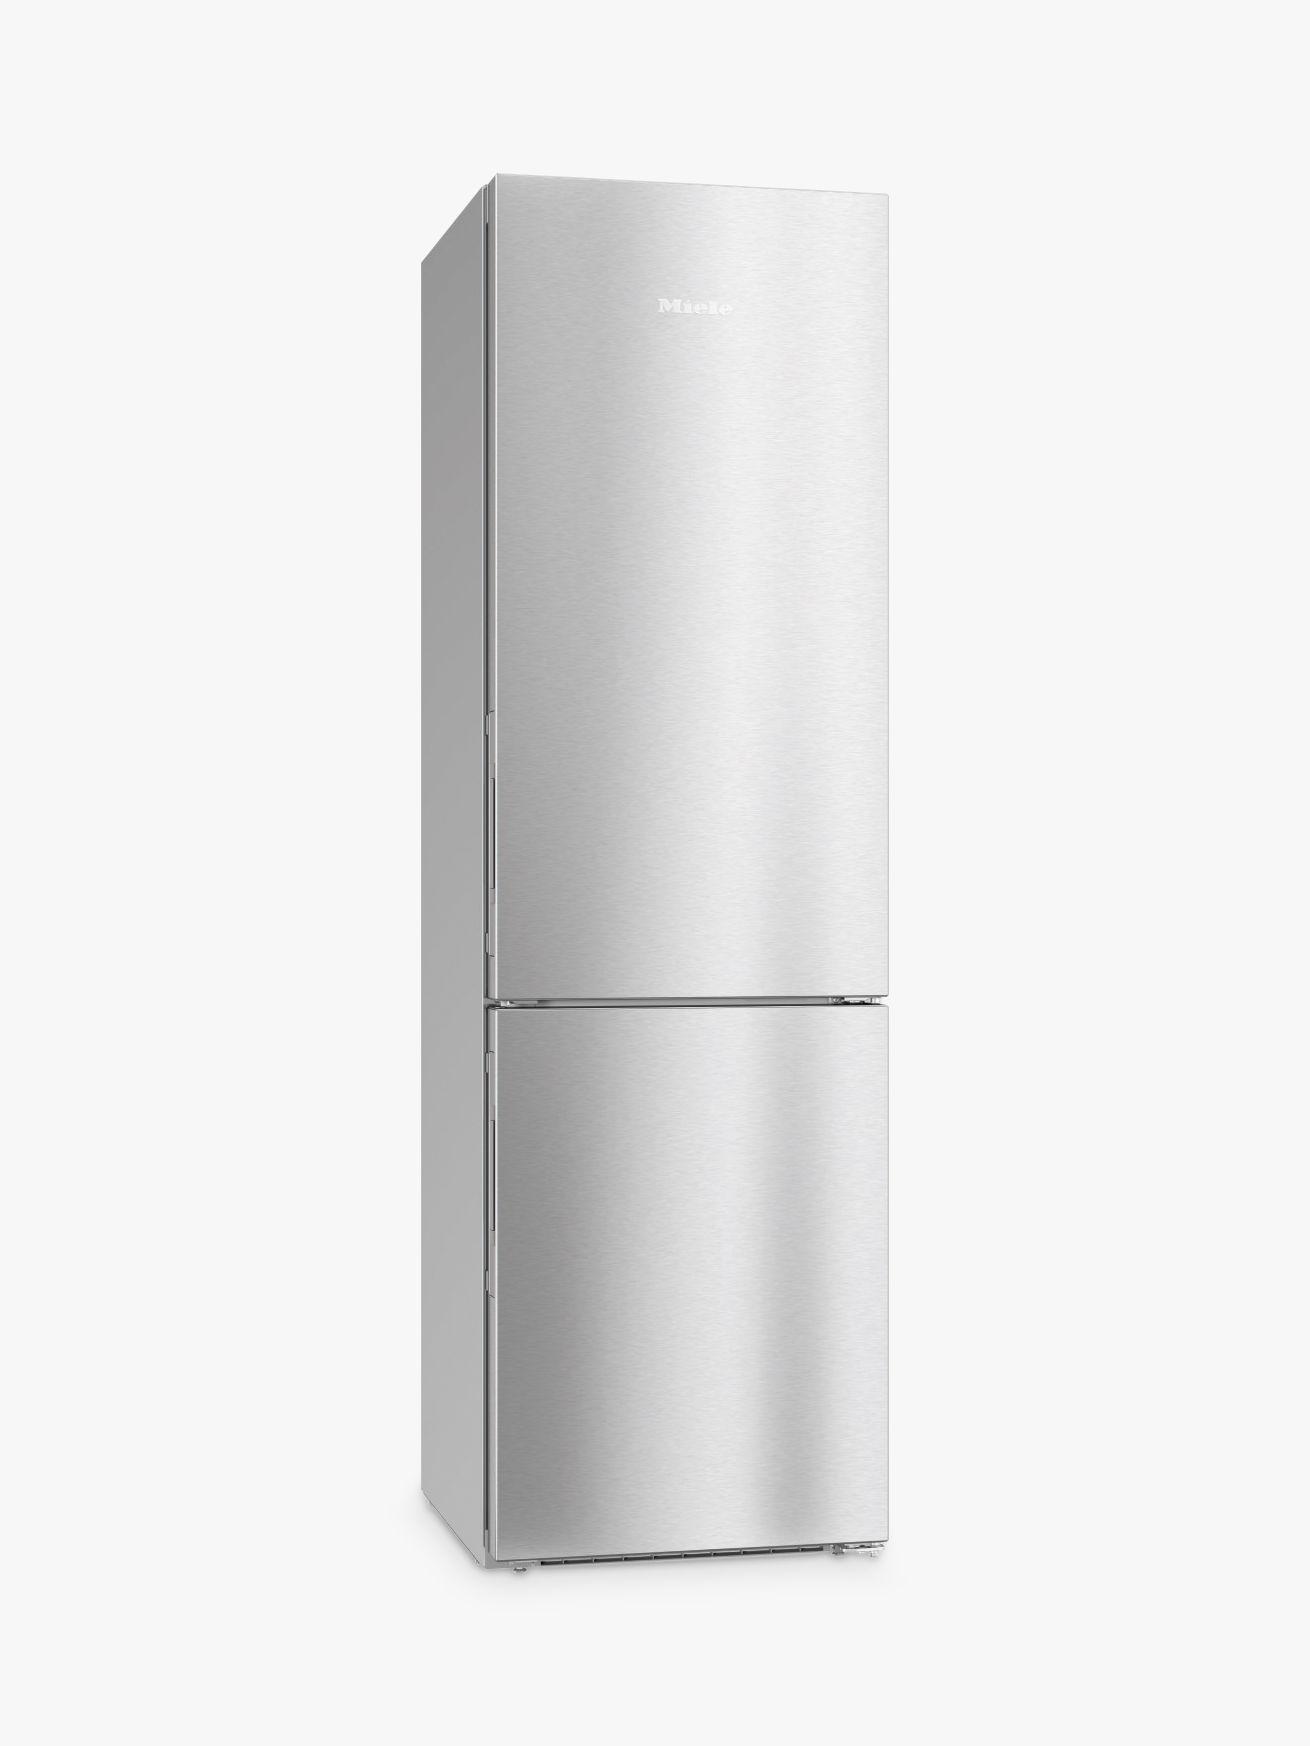 Miele Miele KFN 29483 D EDT CS Fridge Freezer, A+++ Energy Rating, 60cm Wide, Stainless Steel